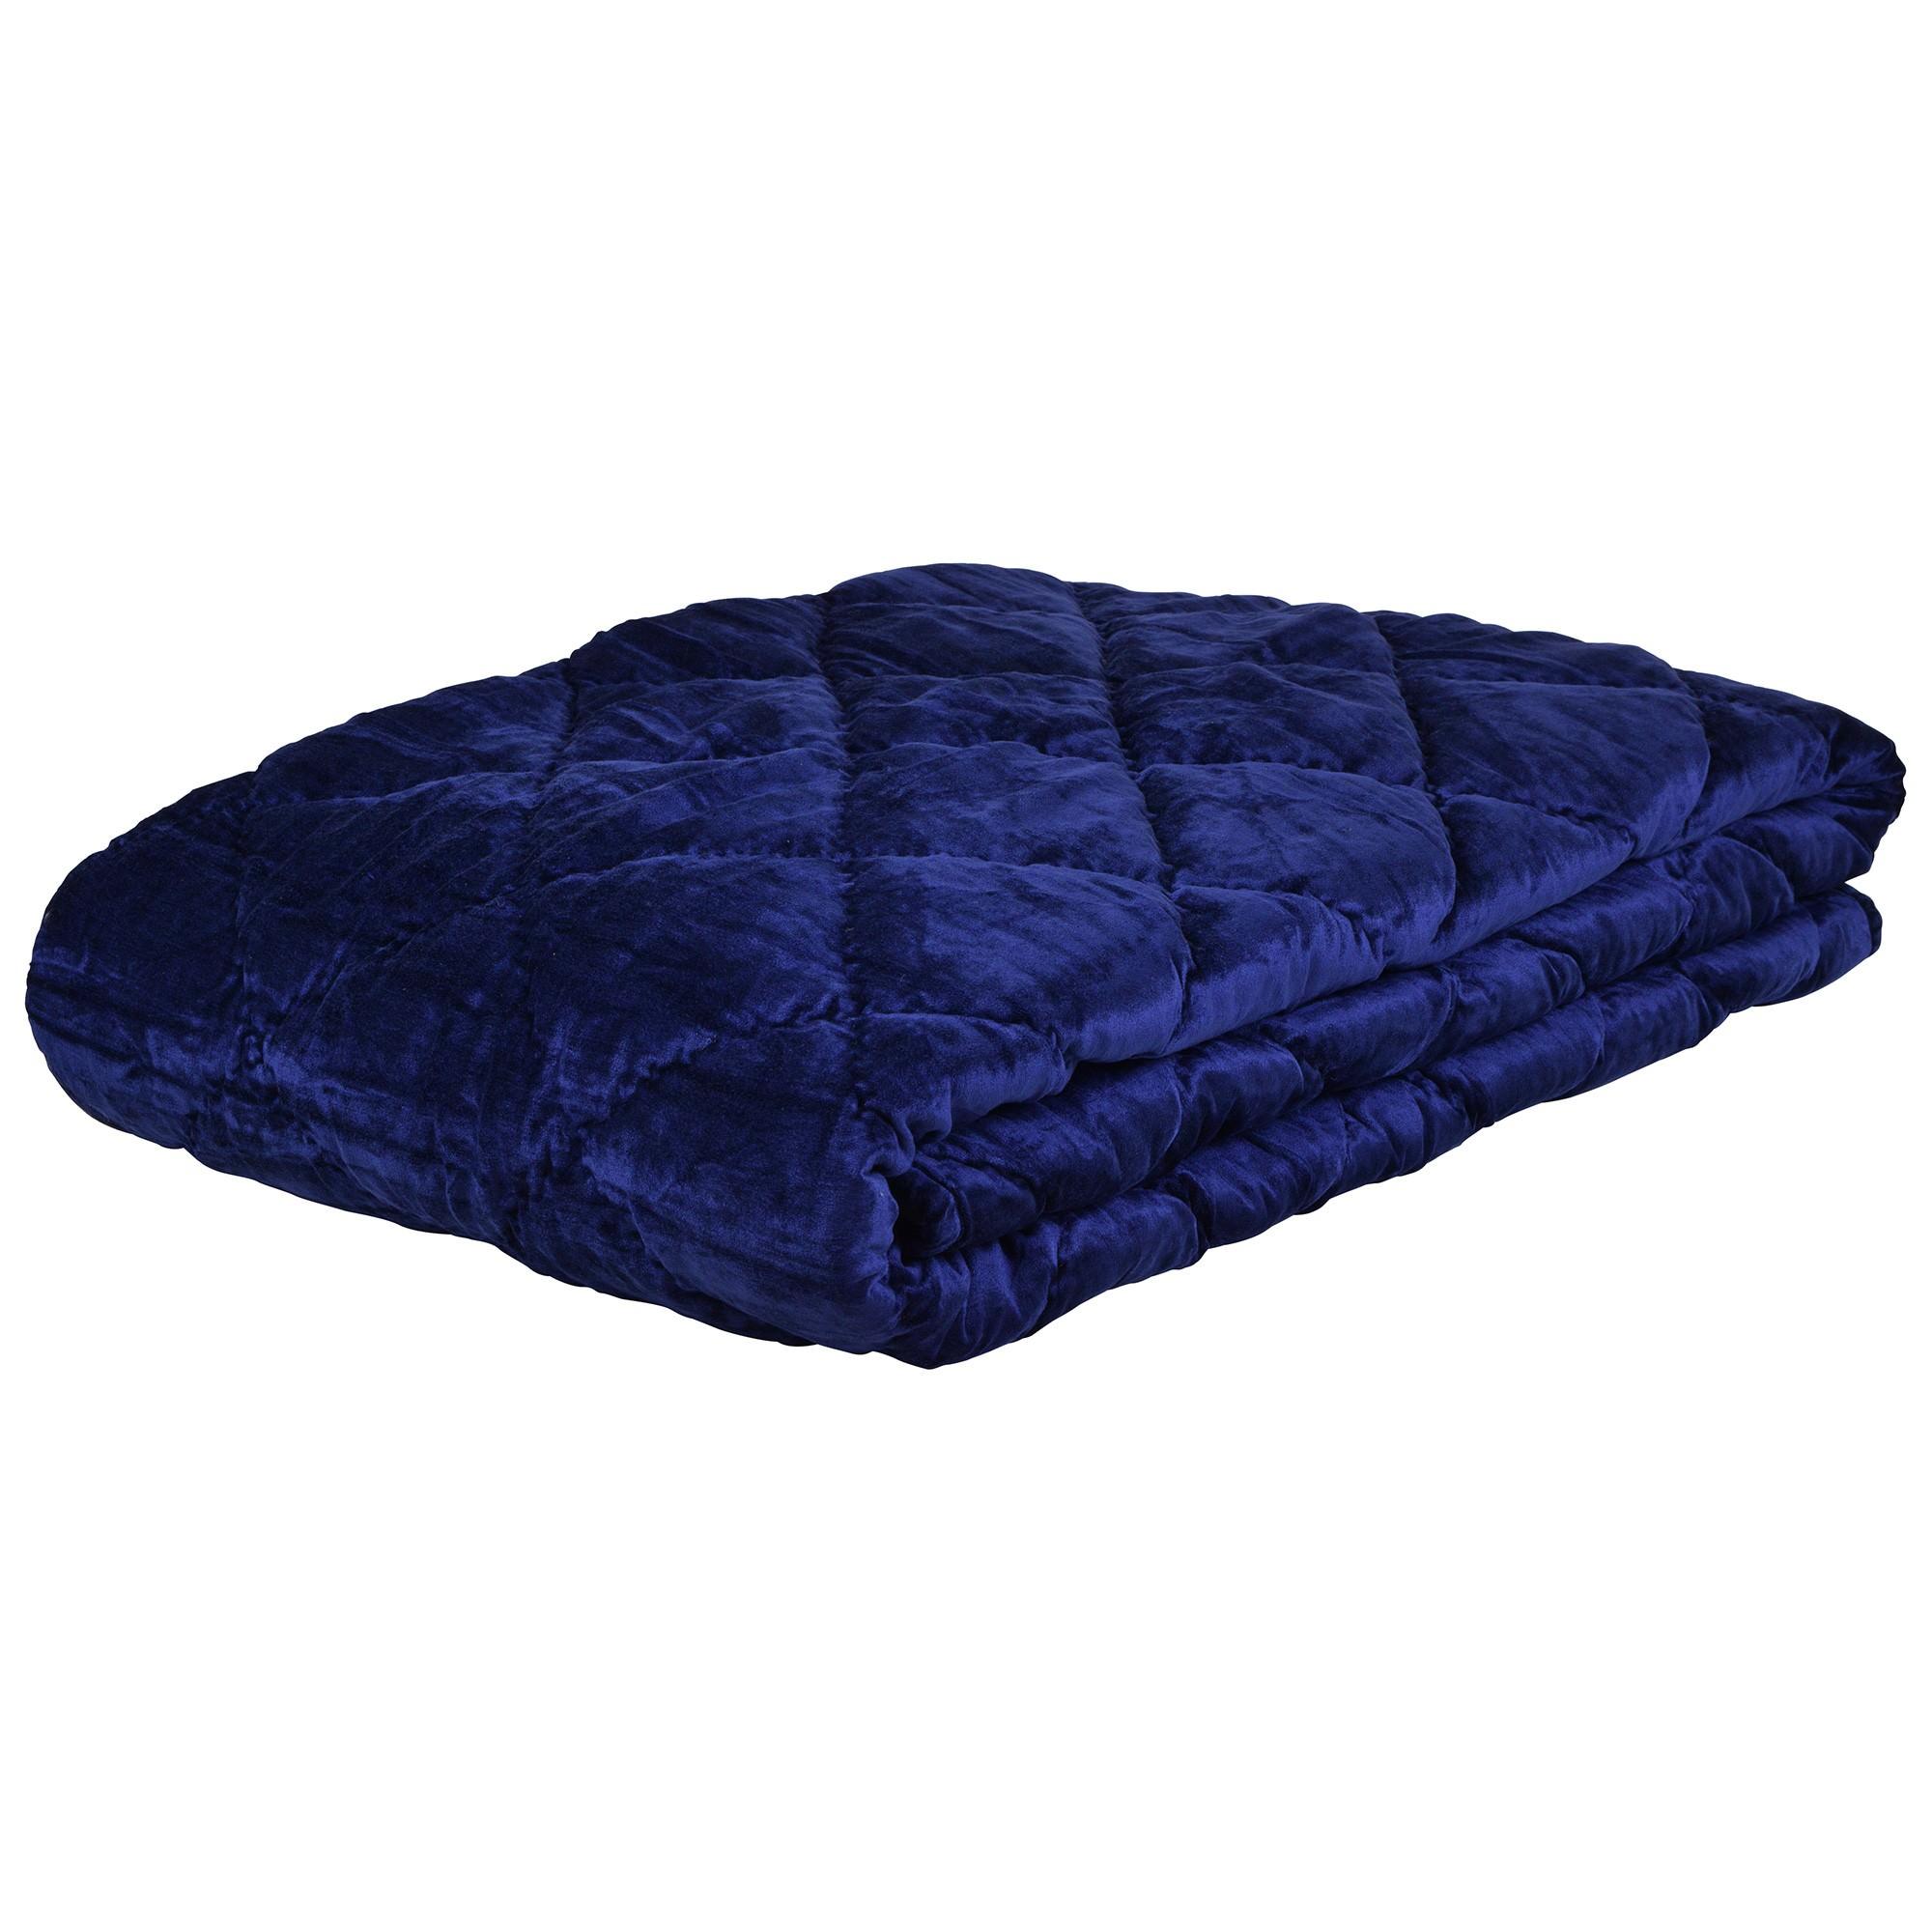 Florentine Quilted Velvet Comforter, Navy